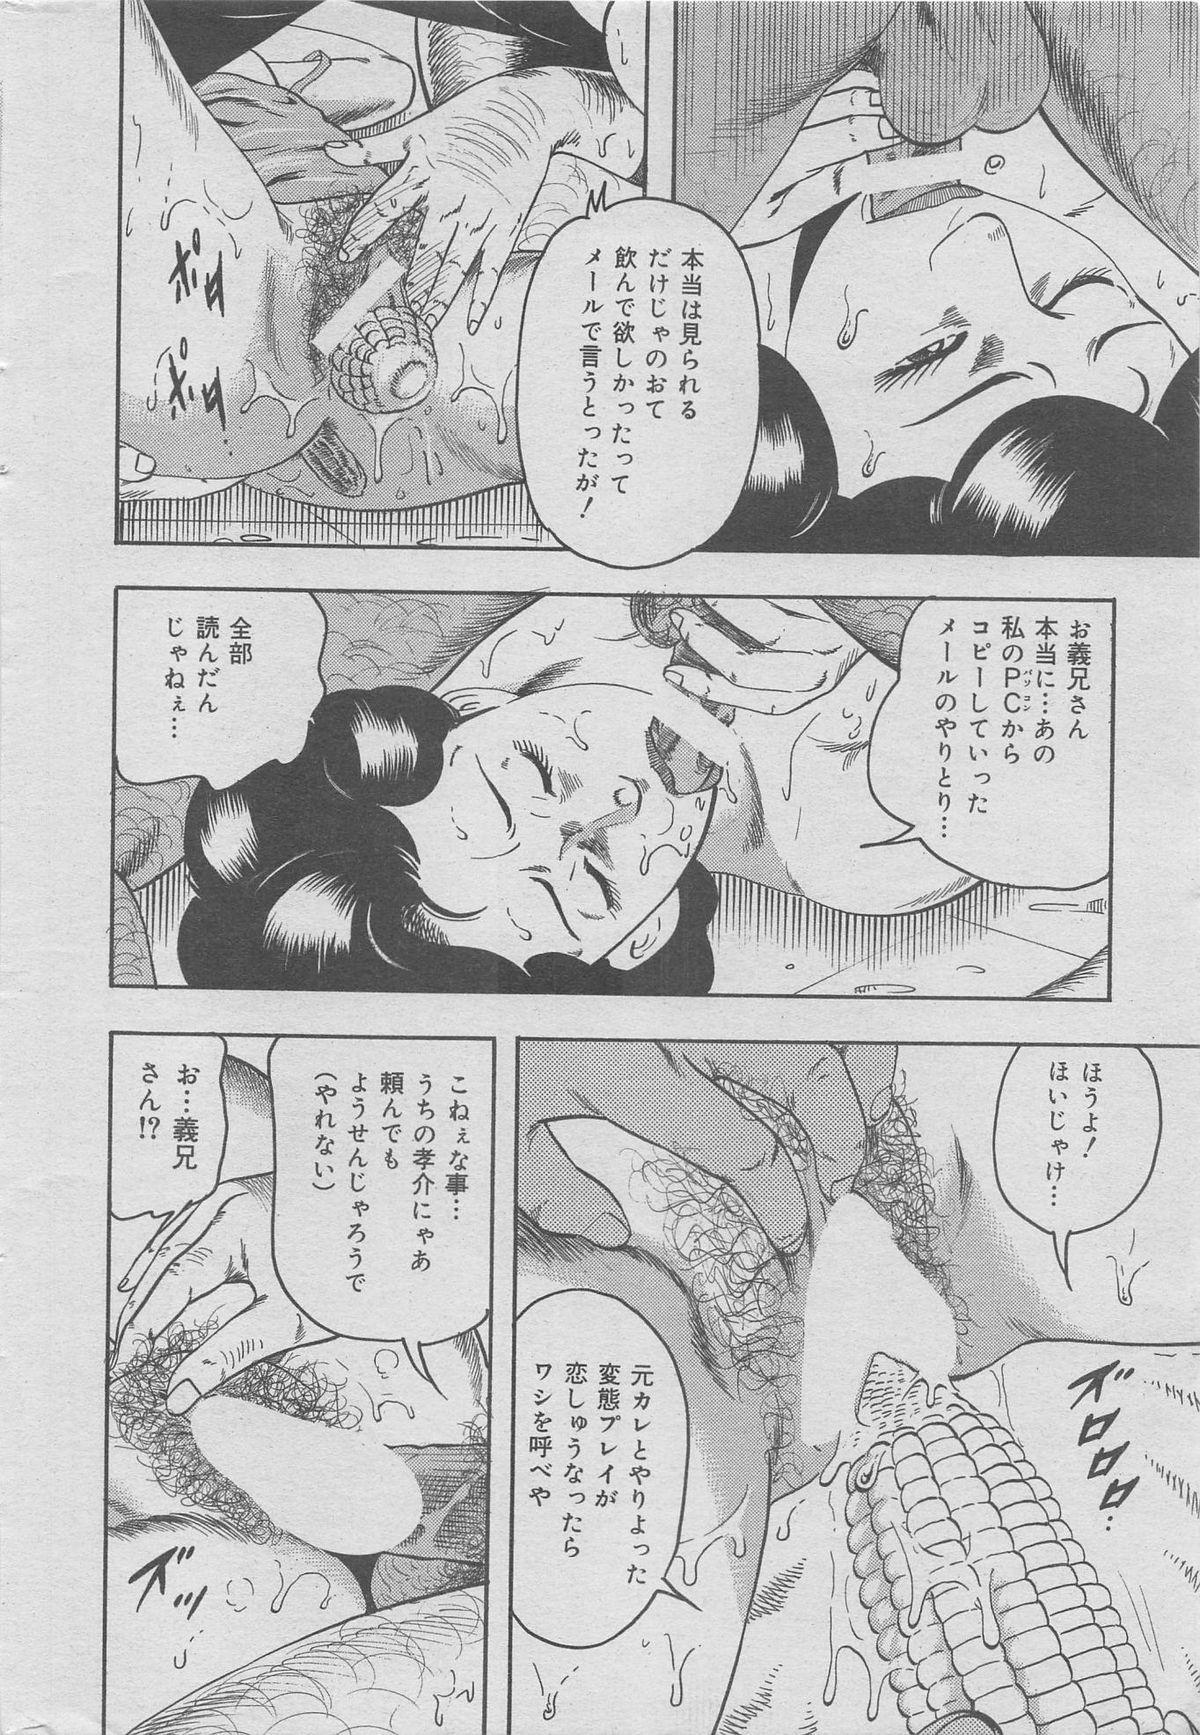 Hontou ni Atta Kindanai vol.7 13